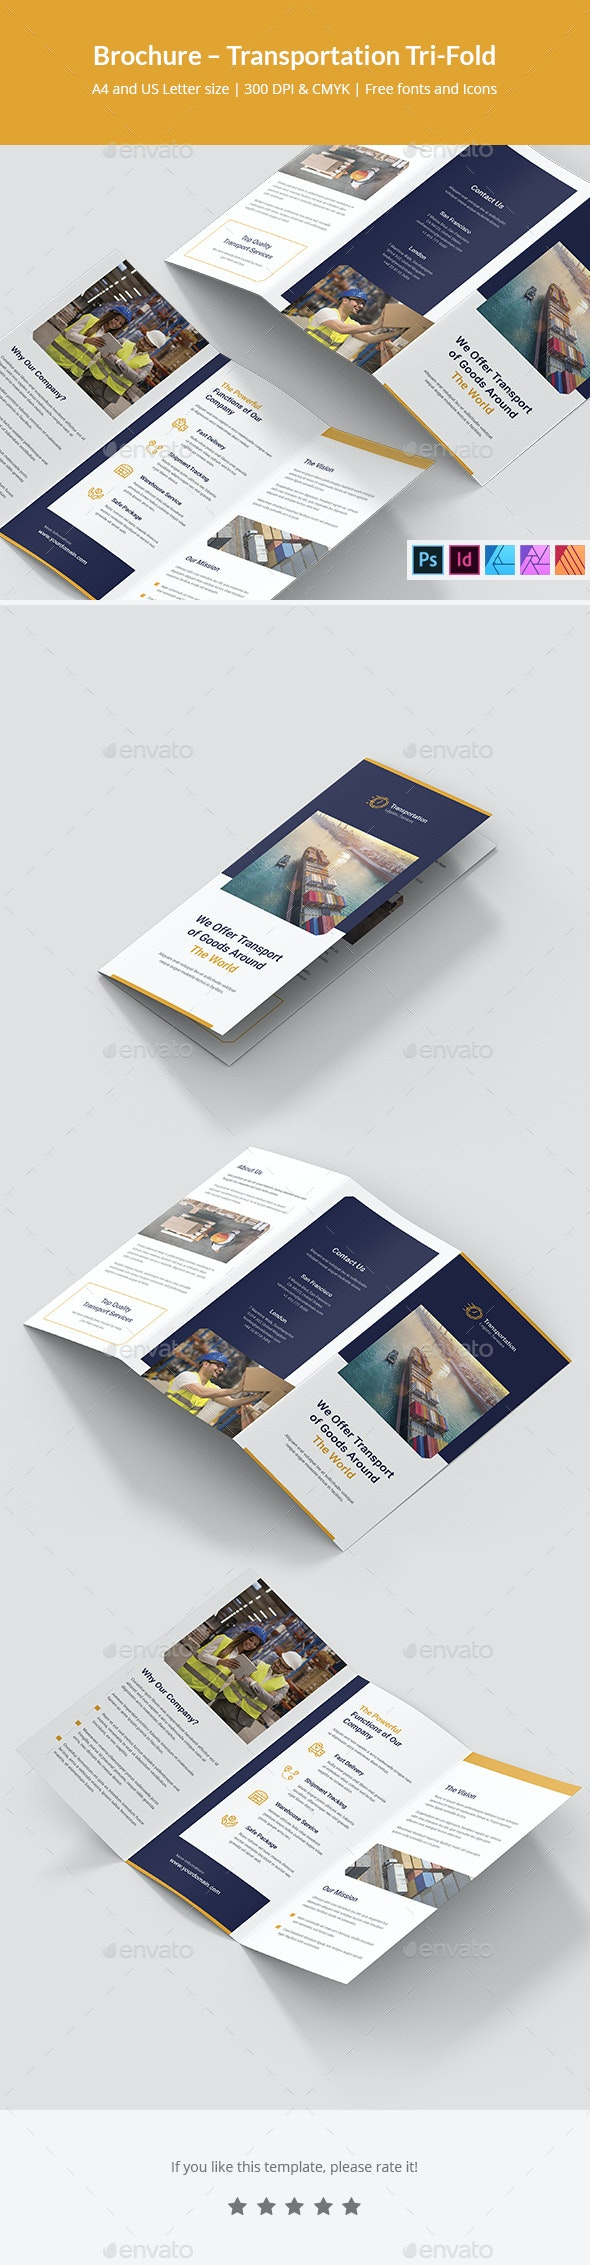 Brochure Transportation Tri-Fold - Corporate Brochures